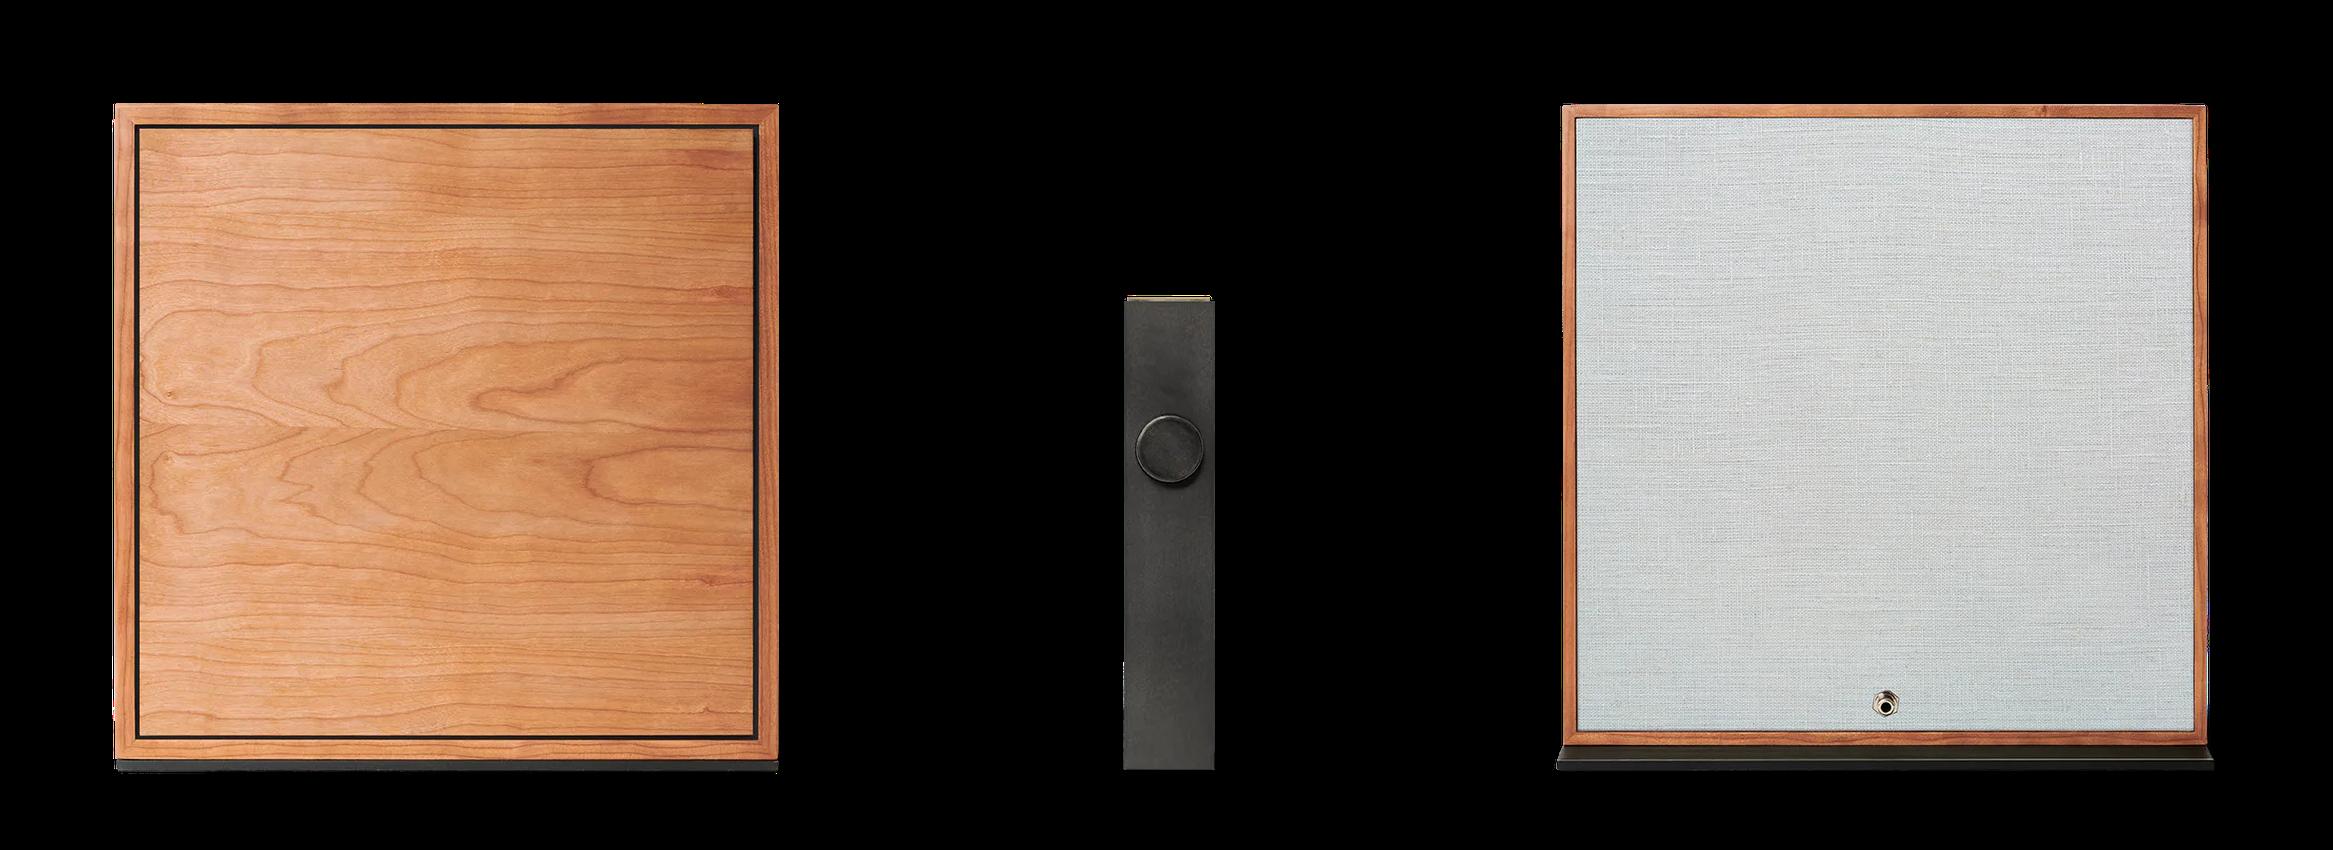 Oda Speaker System